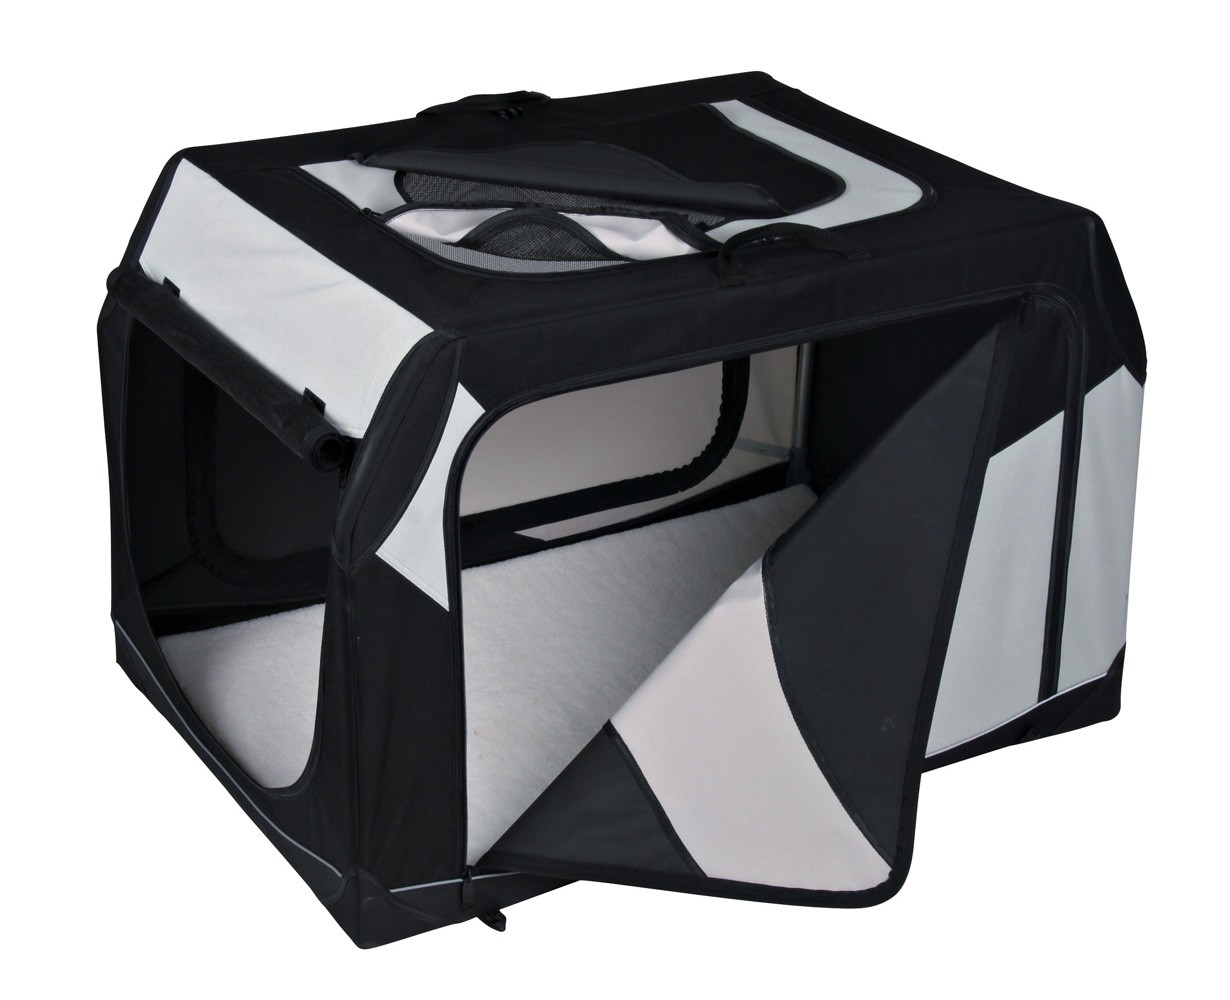 Vario Transportbox Gr. M-L TRIXIE schwarz/grau 91x58x61cm Bild 1